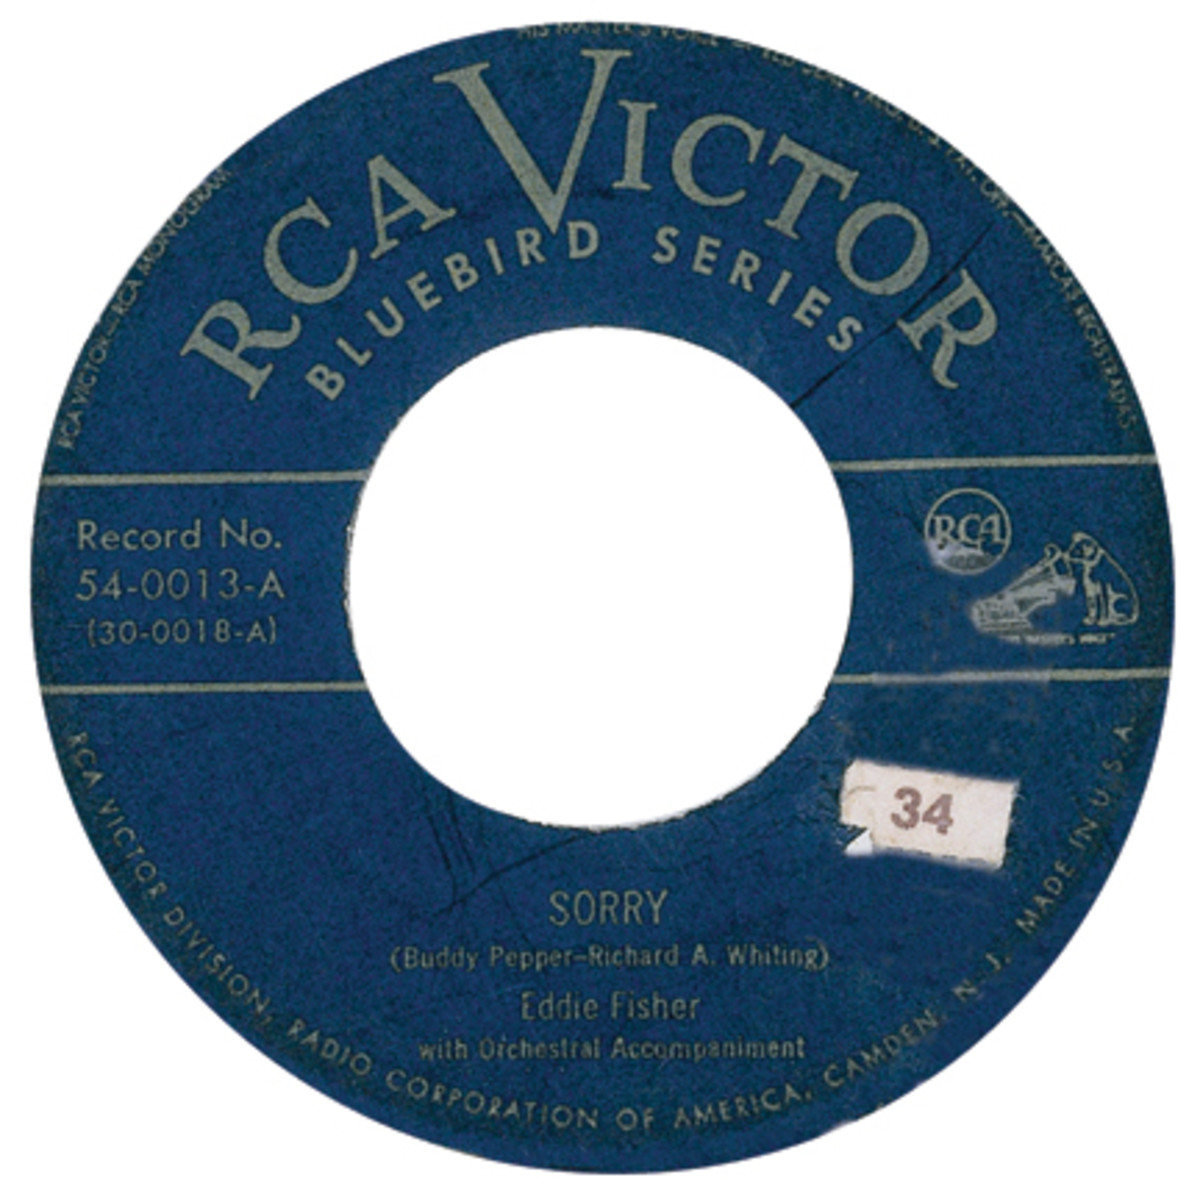 Eddie Fisher RCA 5400013